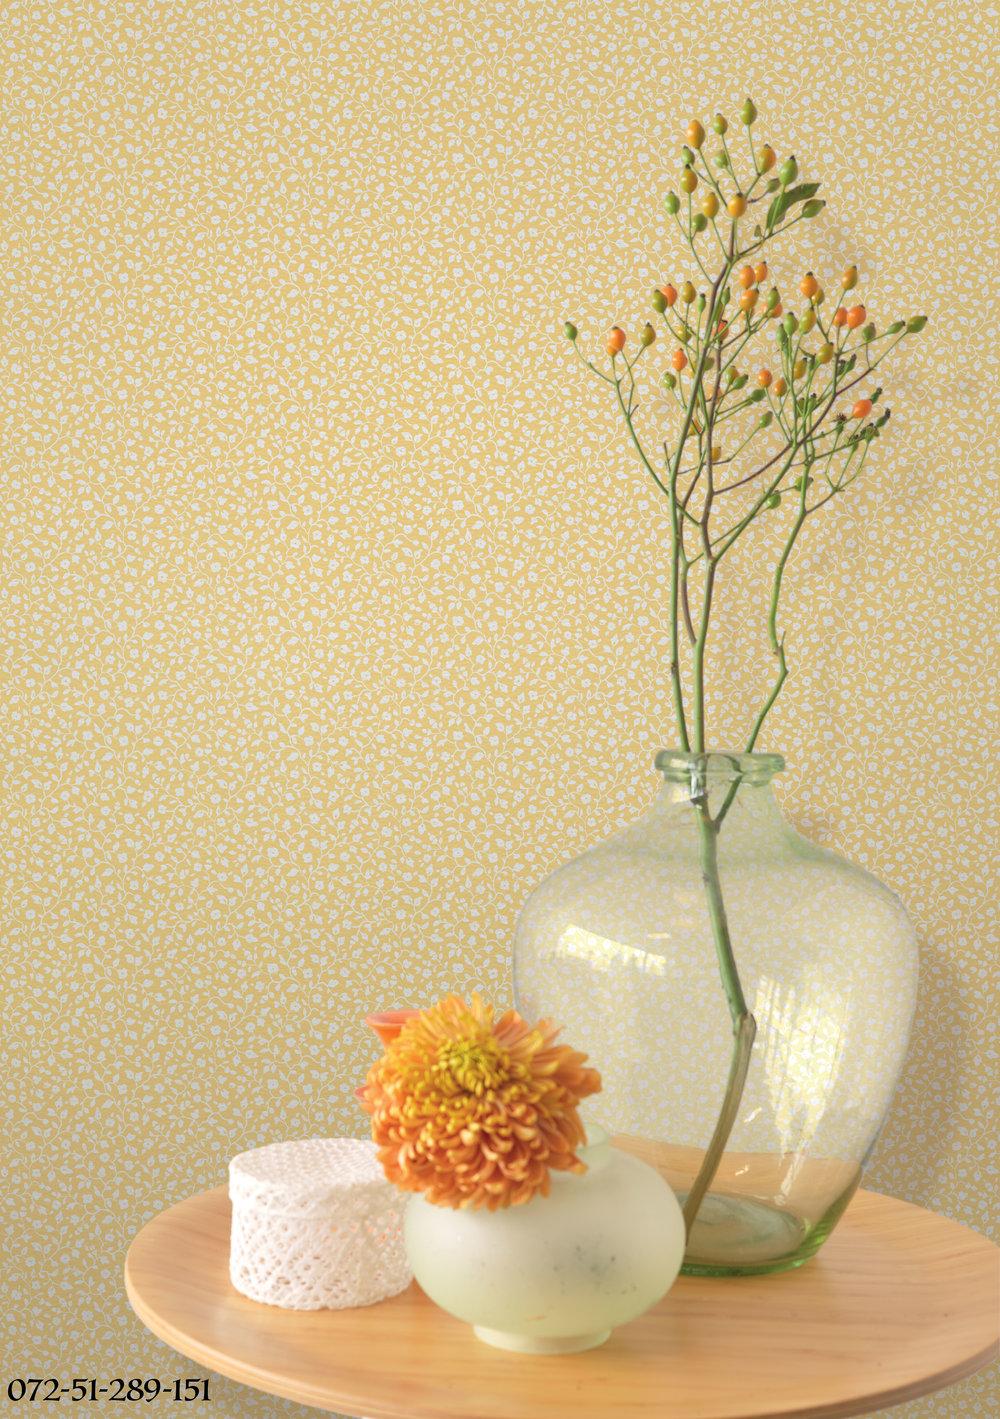 D_51-289151_Petite Fleur4.jpg